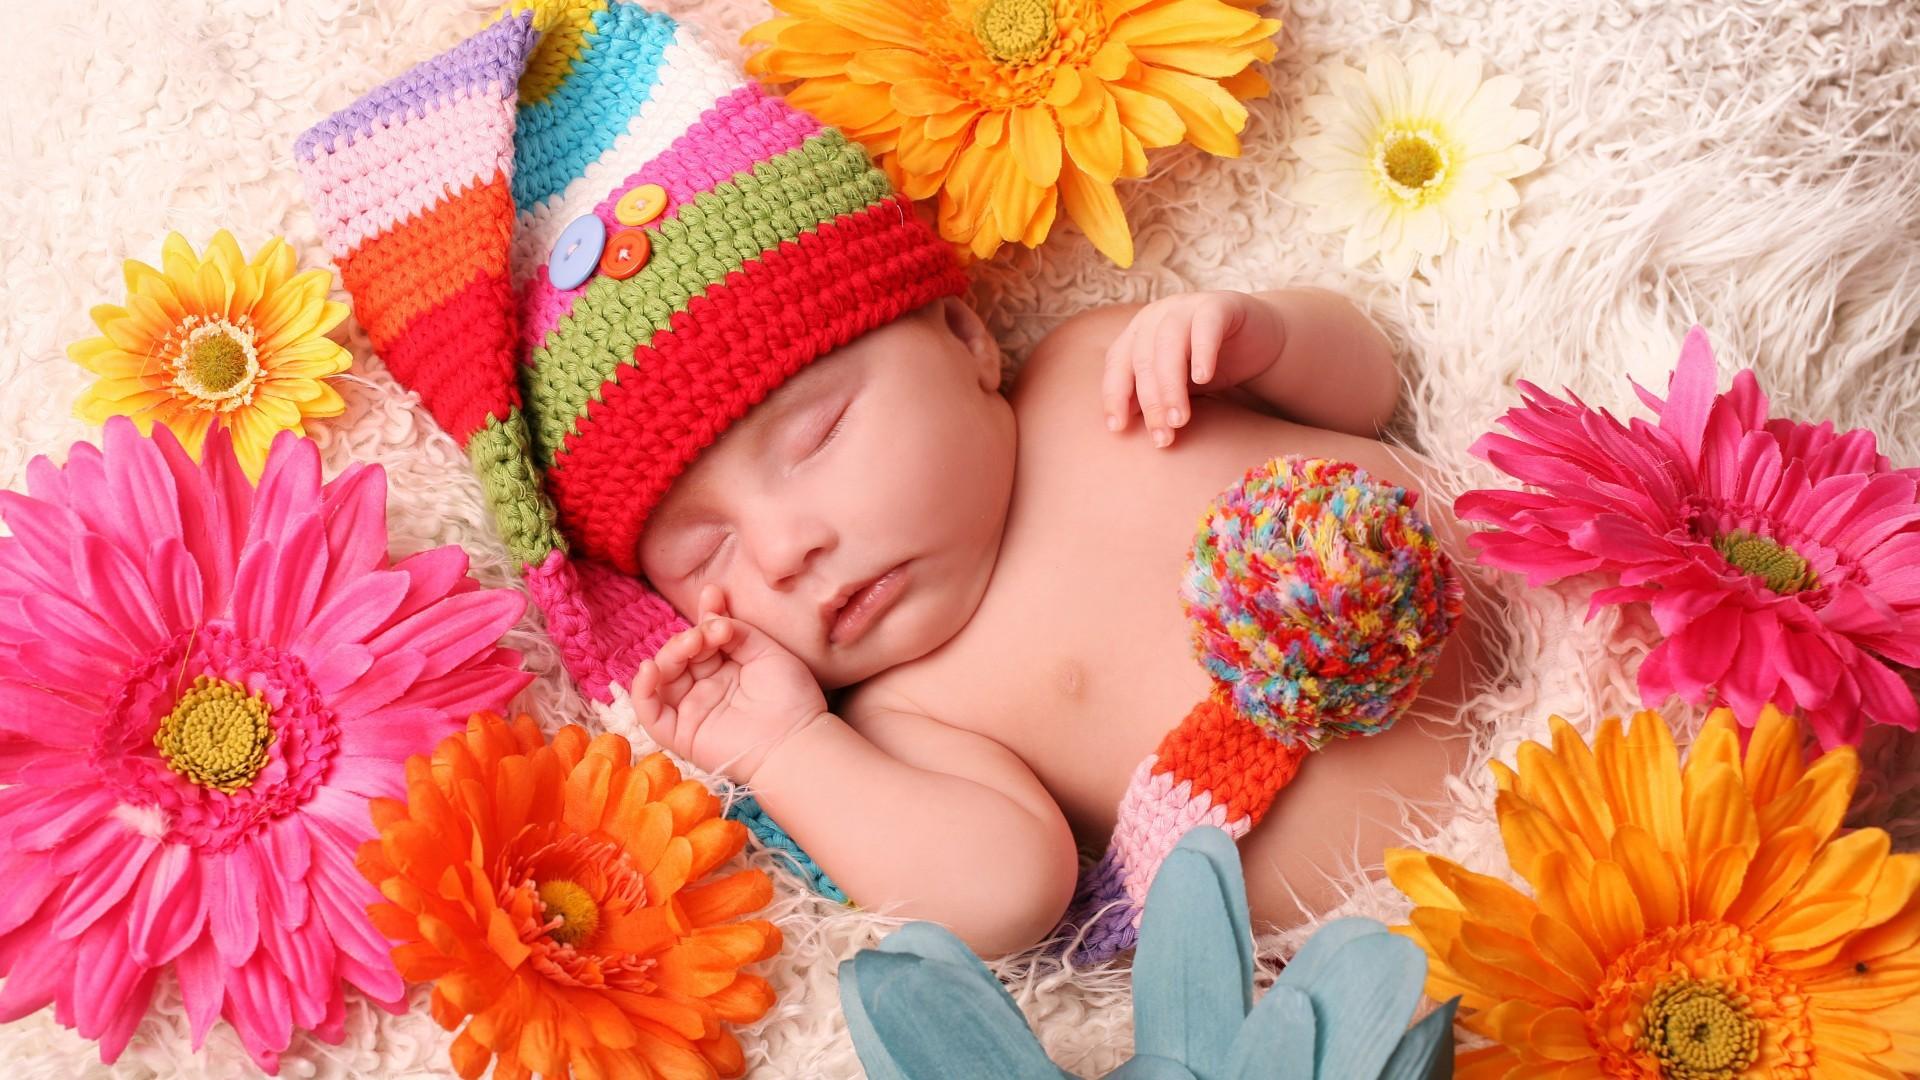 Картинка младенца в цветах